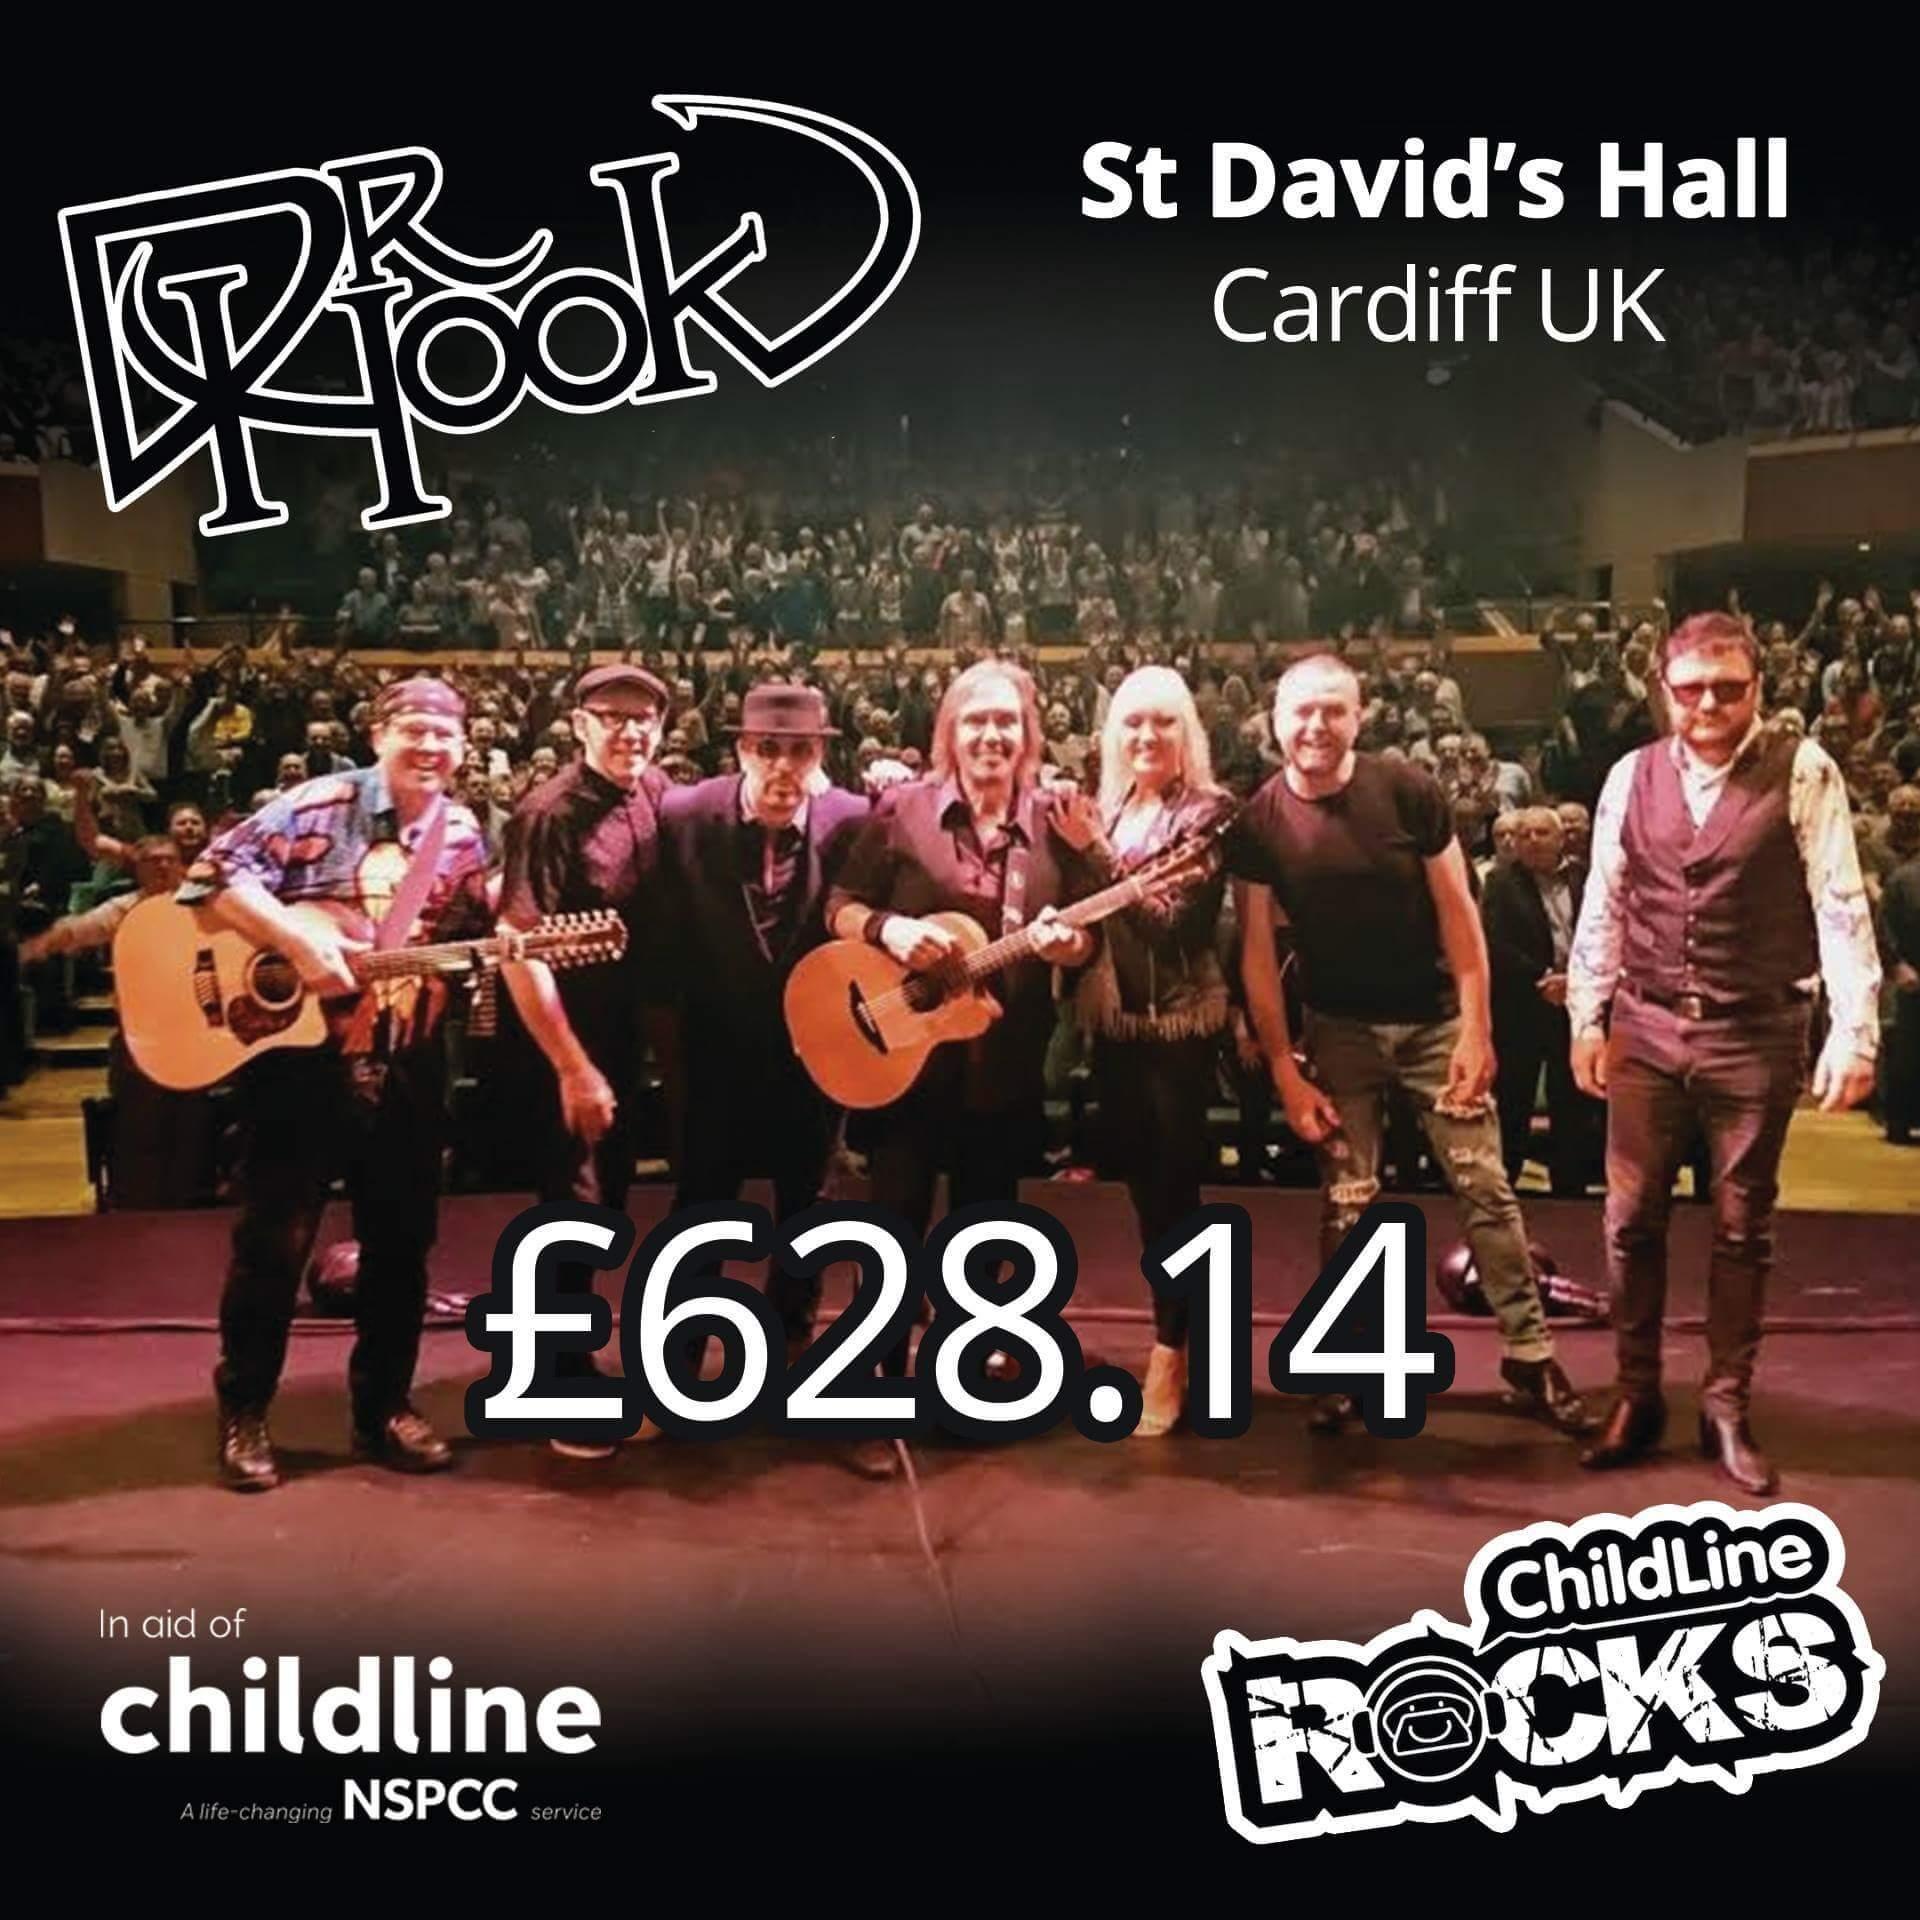 Dr Hook - Fundraising - 2017 - NSPCC Childline - Cardiff